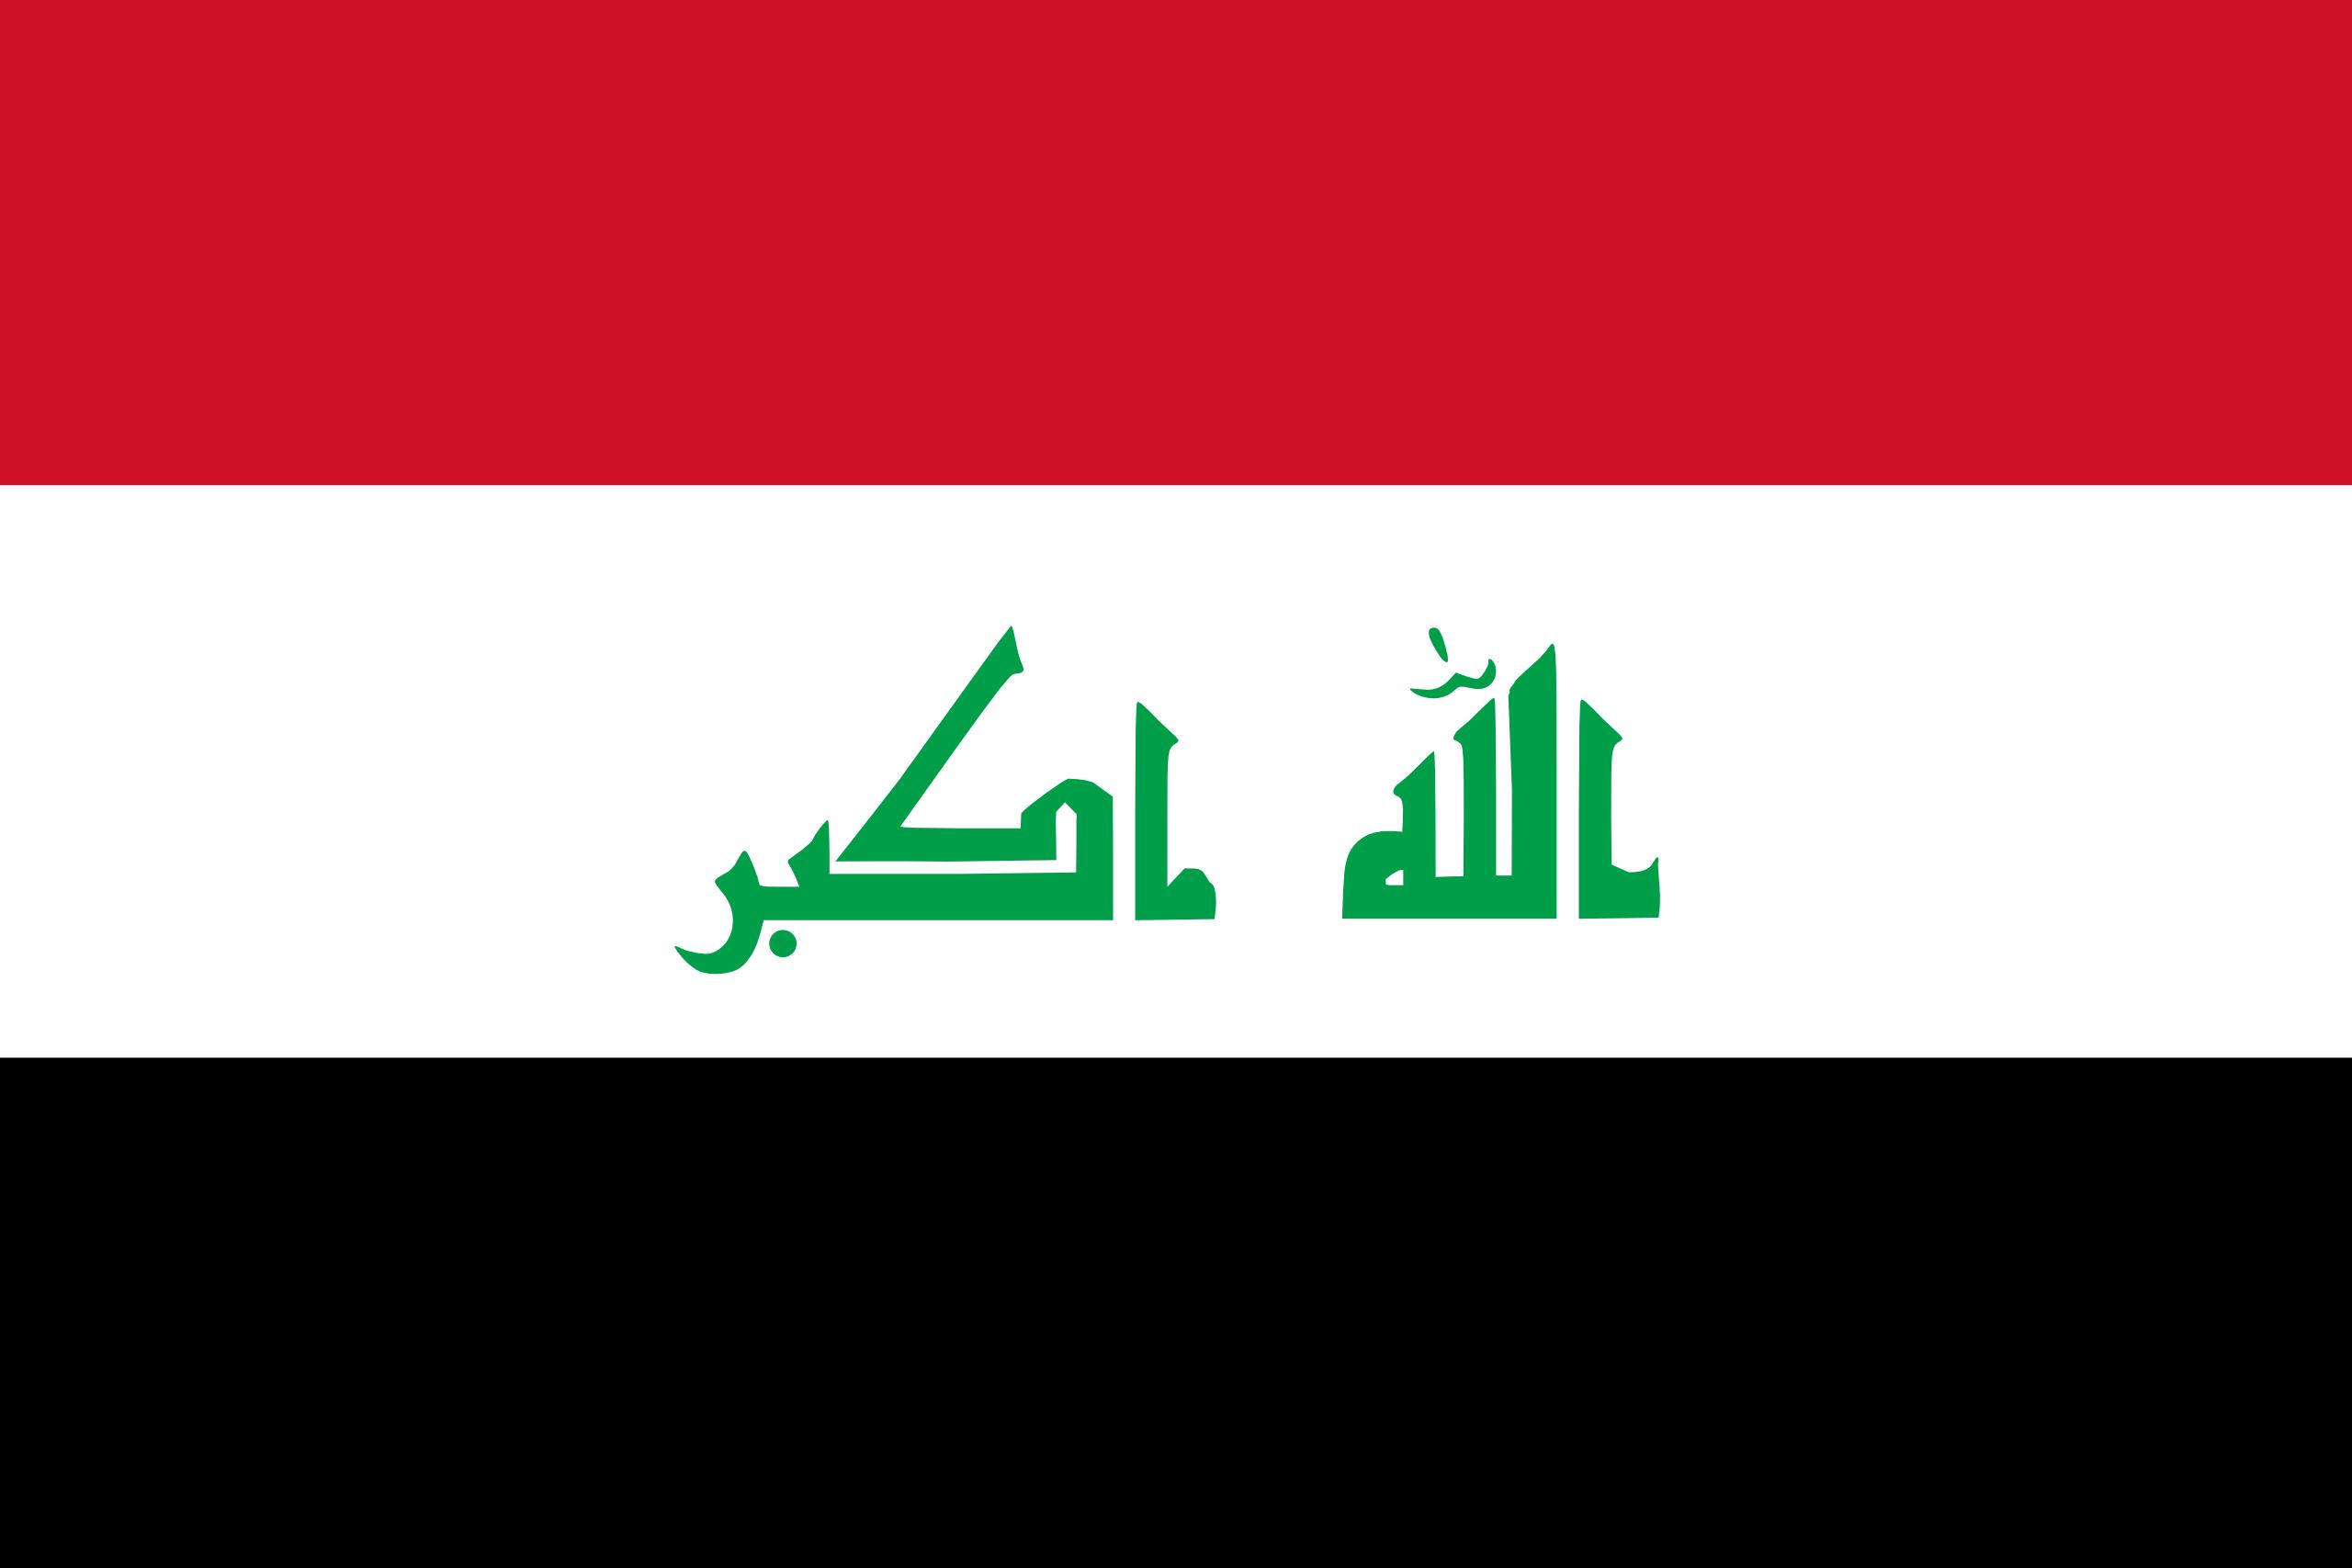 iraq, 国家, 会徽, 徽标, 符号 - 高清壁纸 - 教授-falken.com